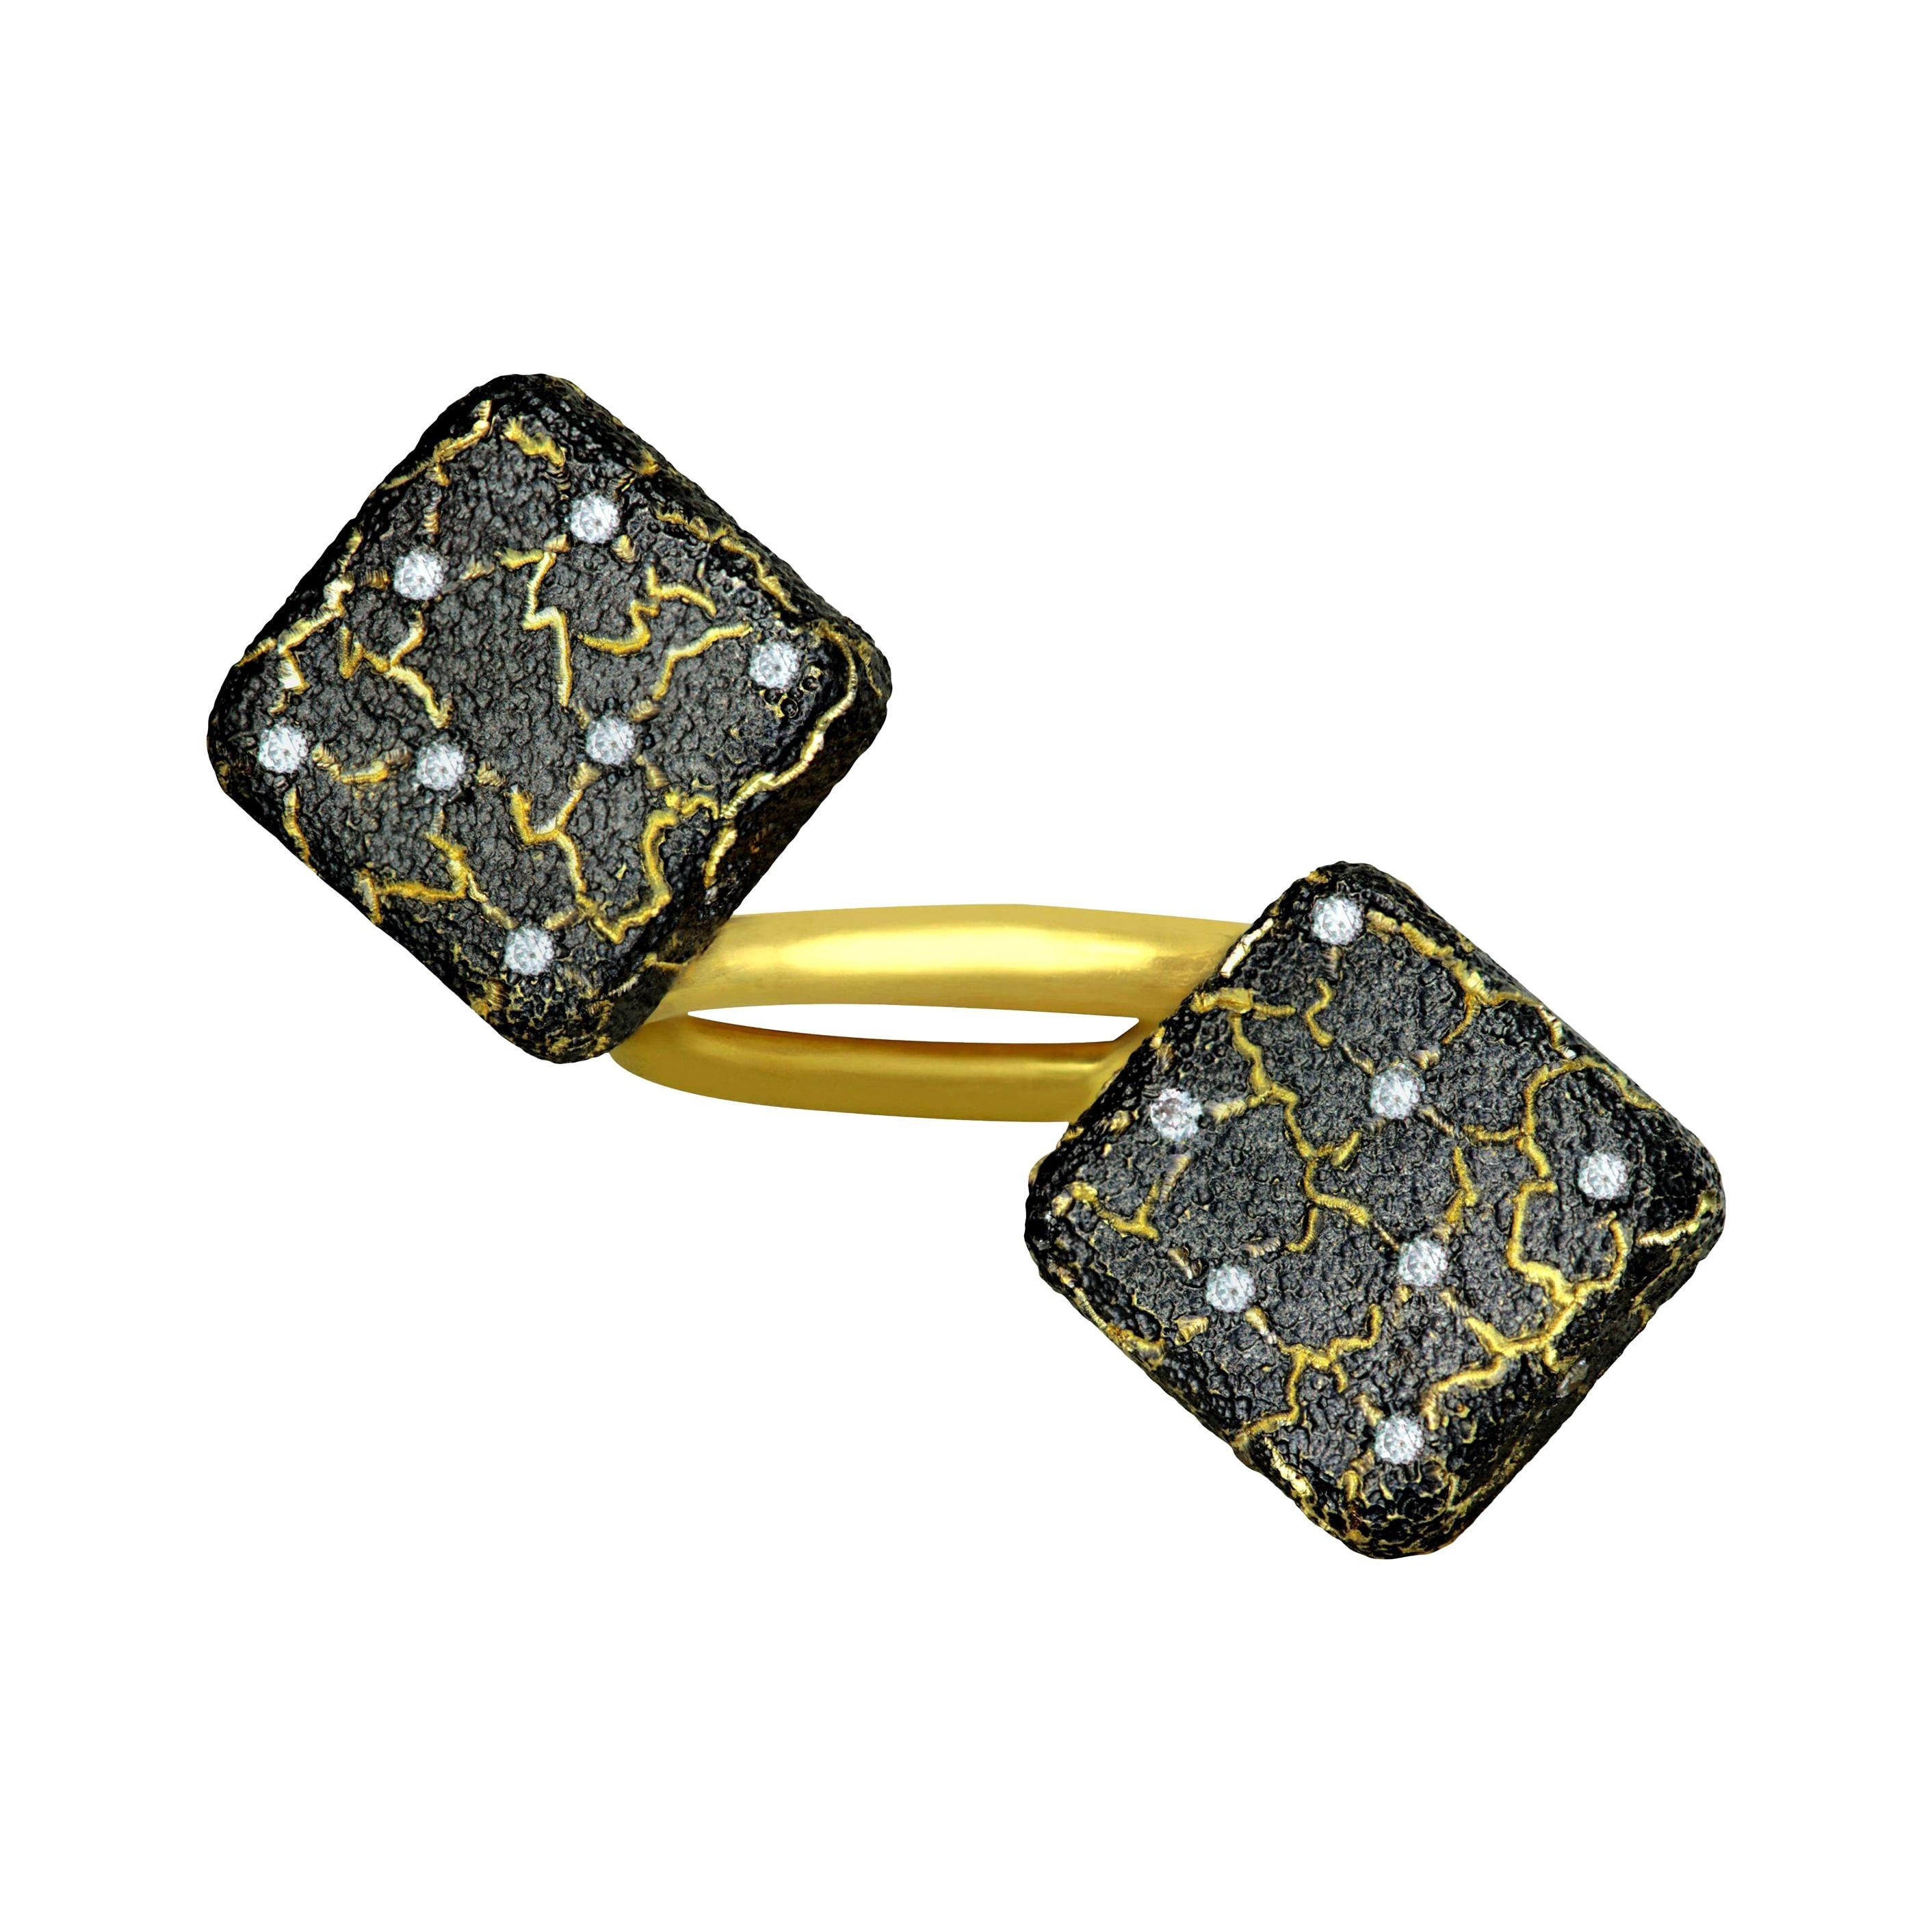 Alex Soldier Diamond Gold Mushroom Lava Textured Ring One of a Kind